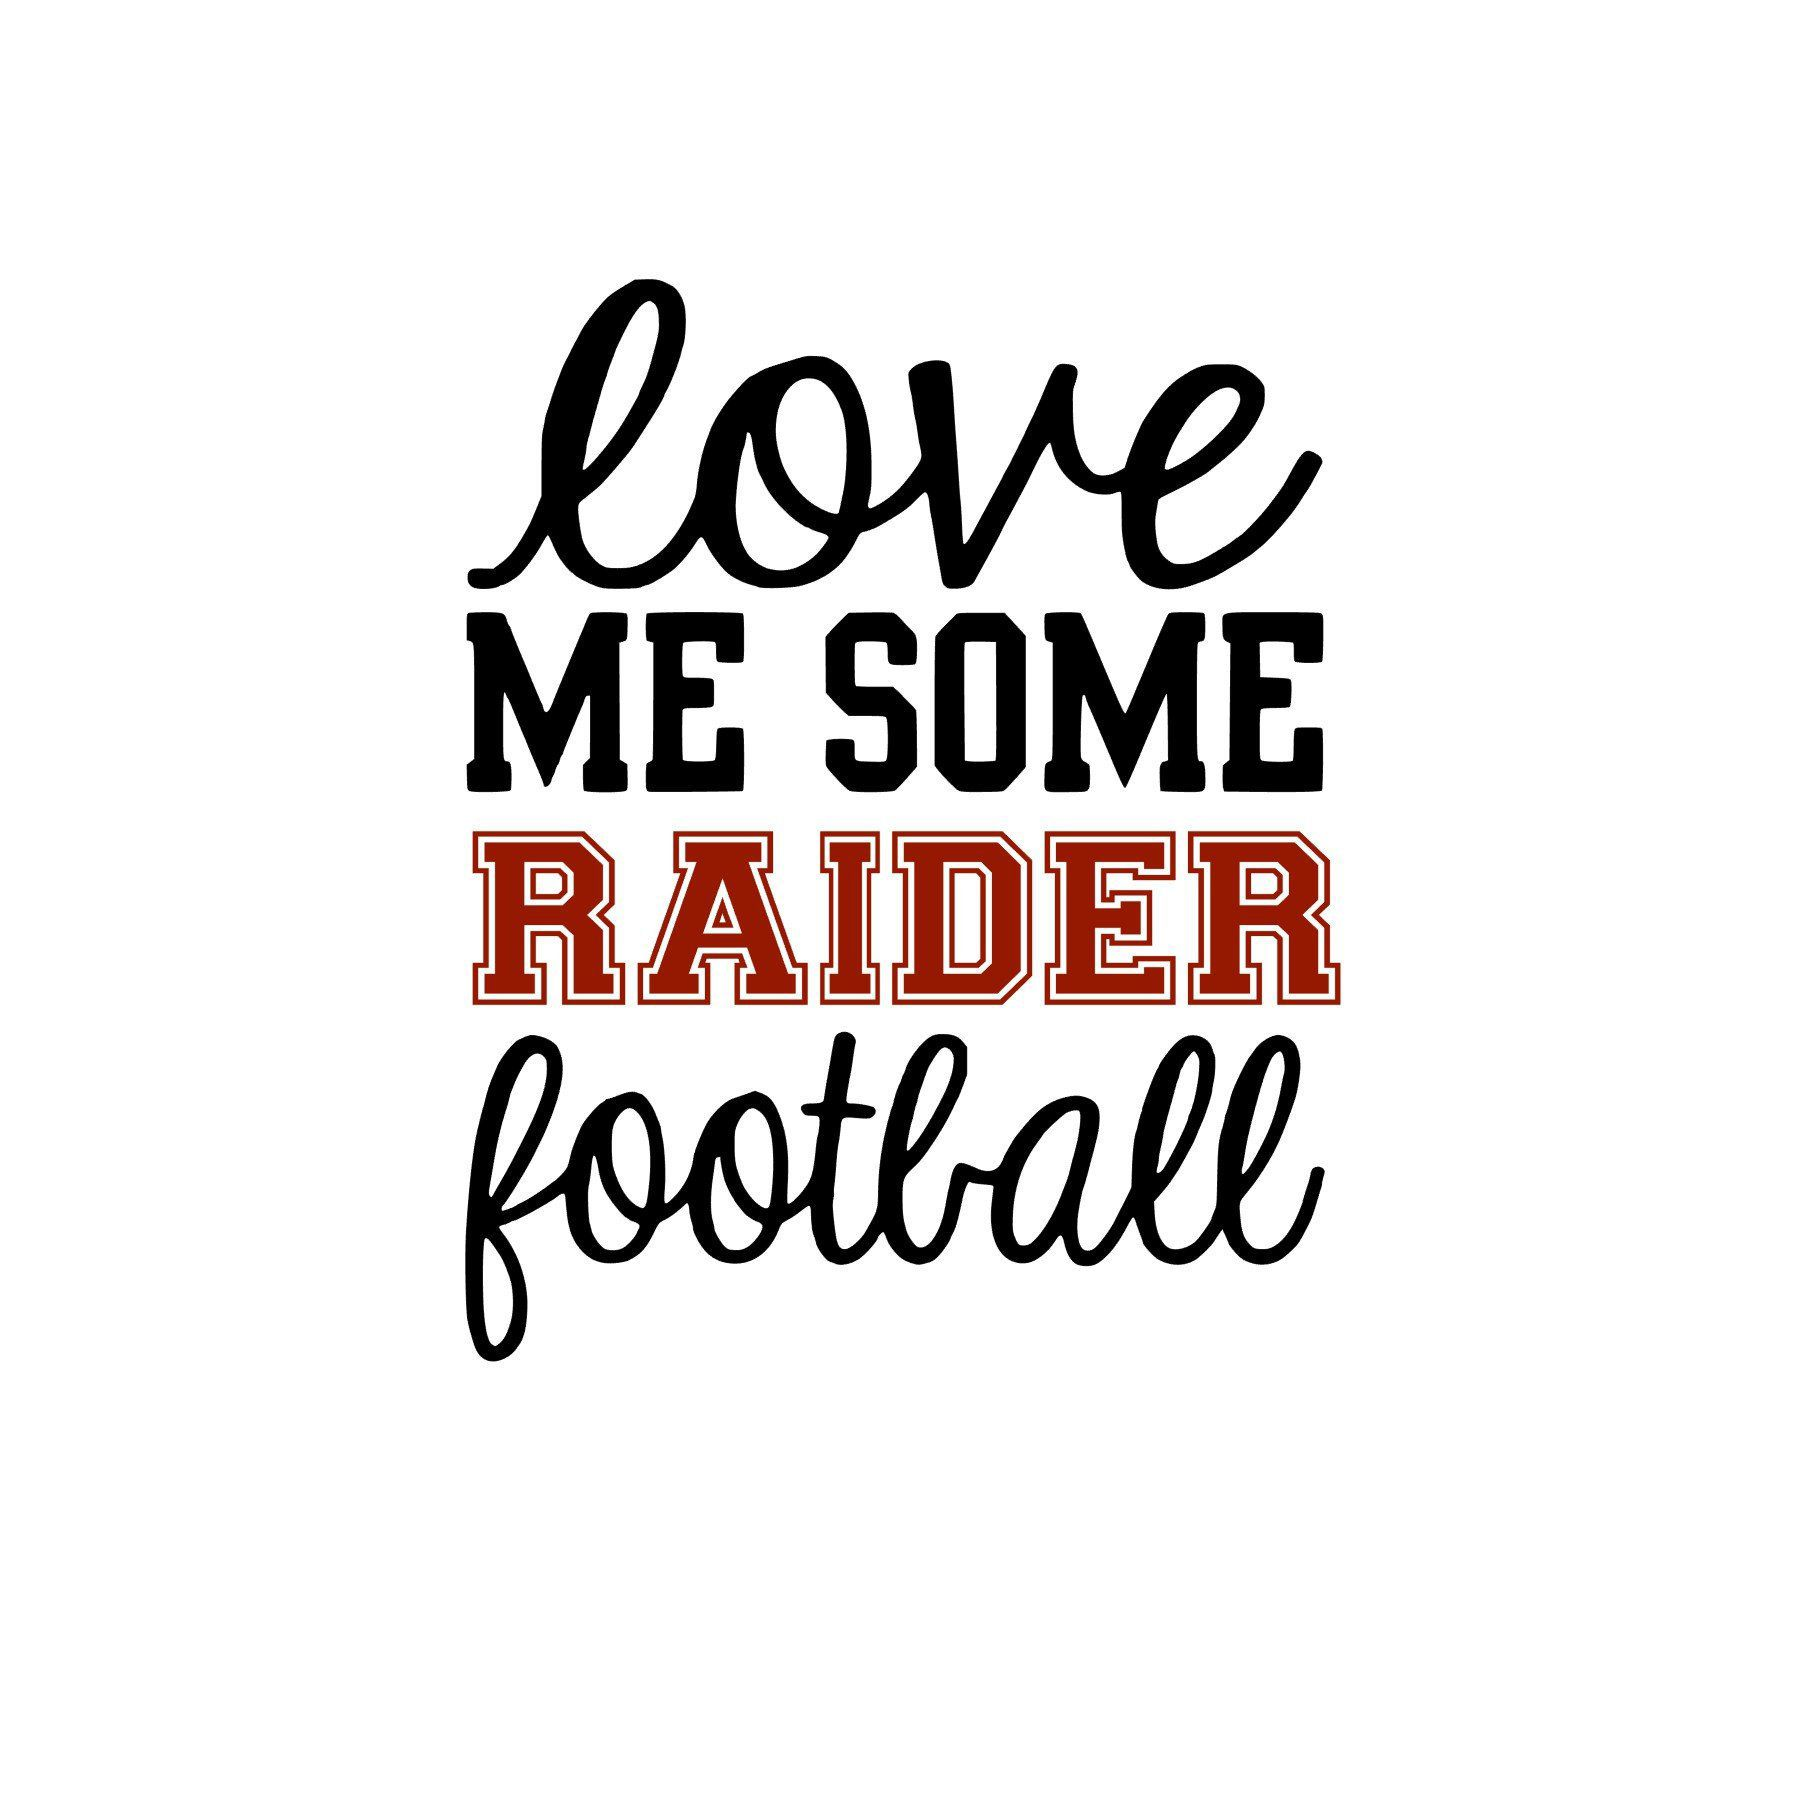 Download Love Me Some Raider Football SVG | Raiders football ...